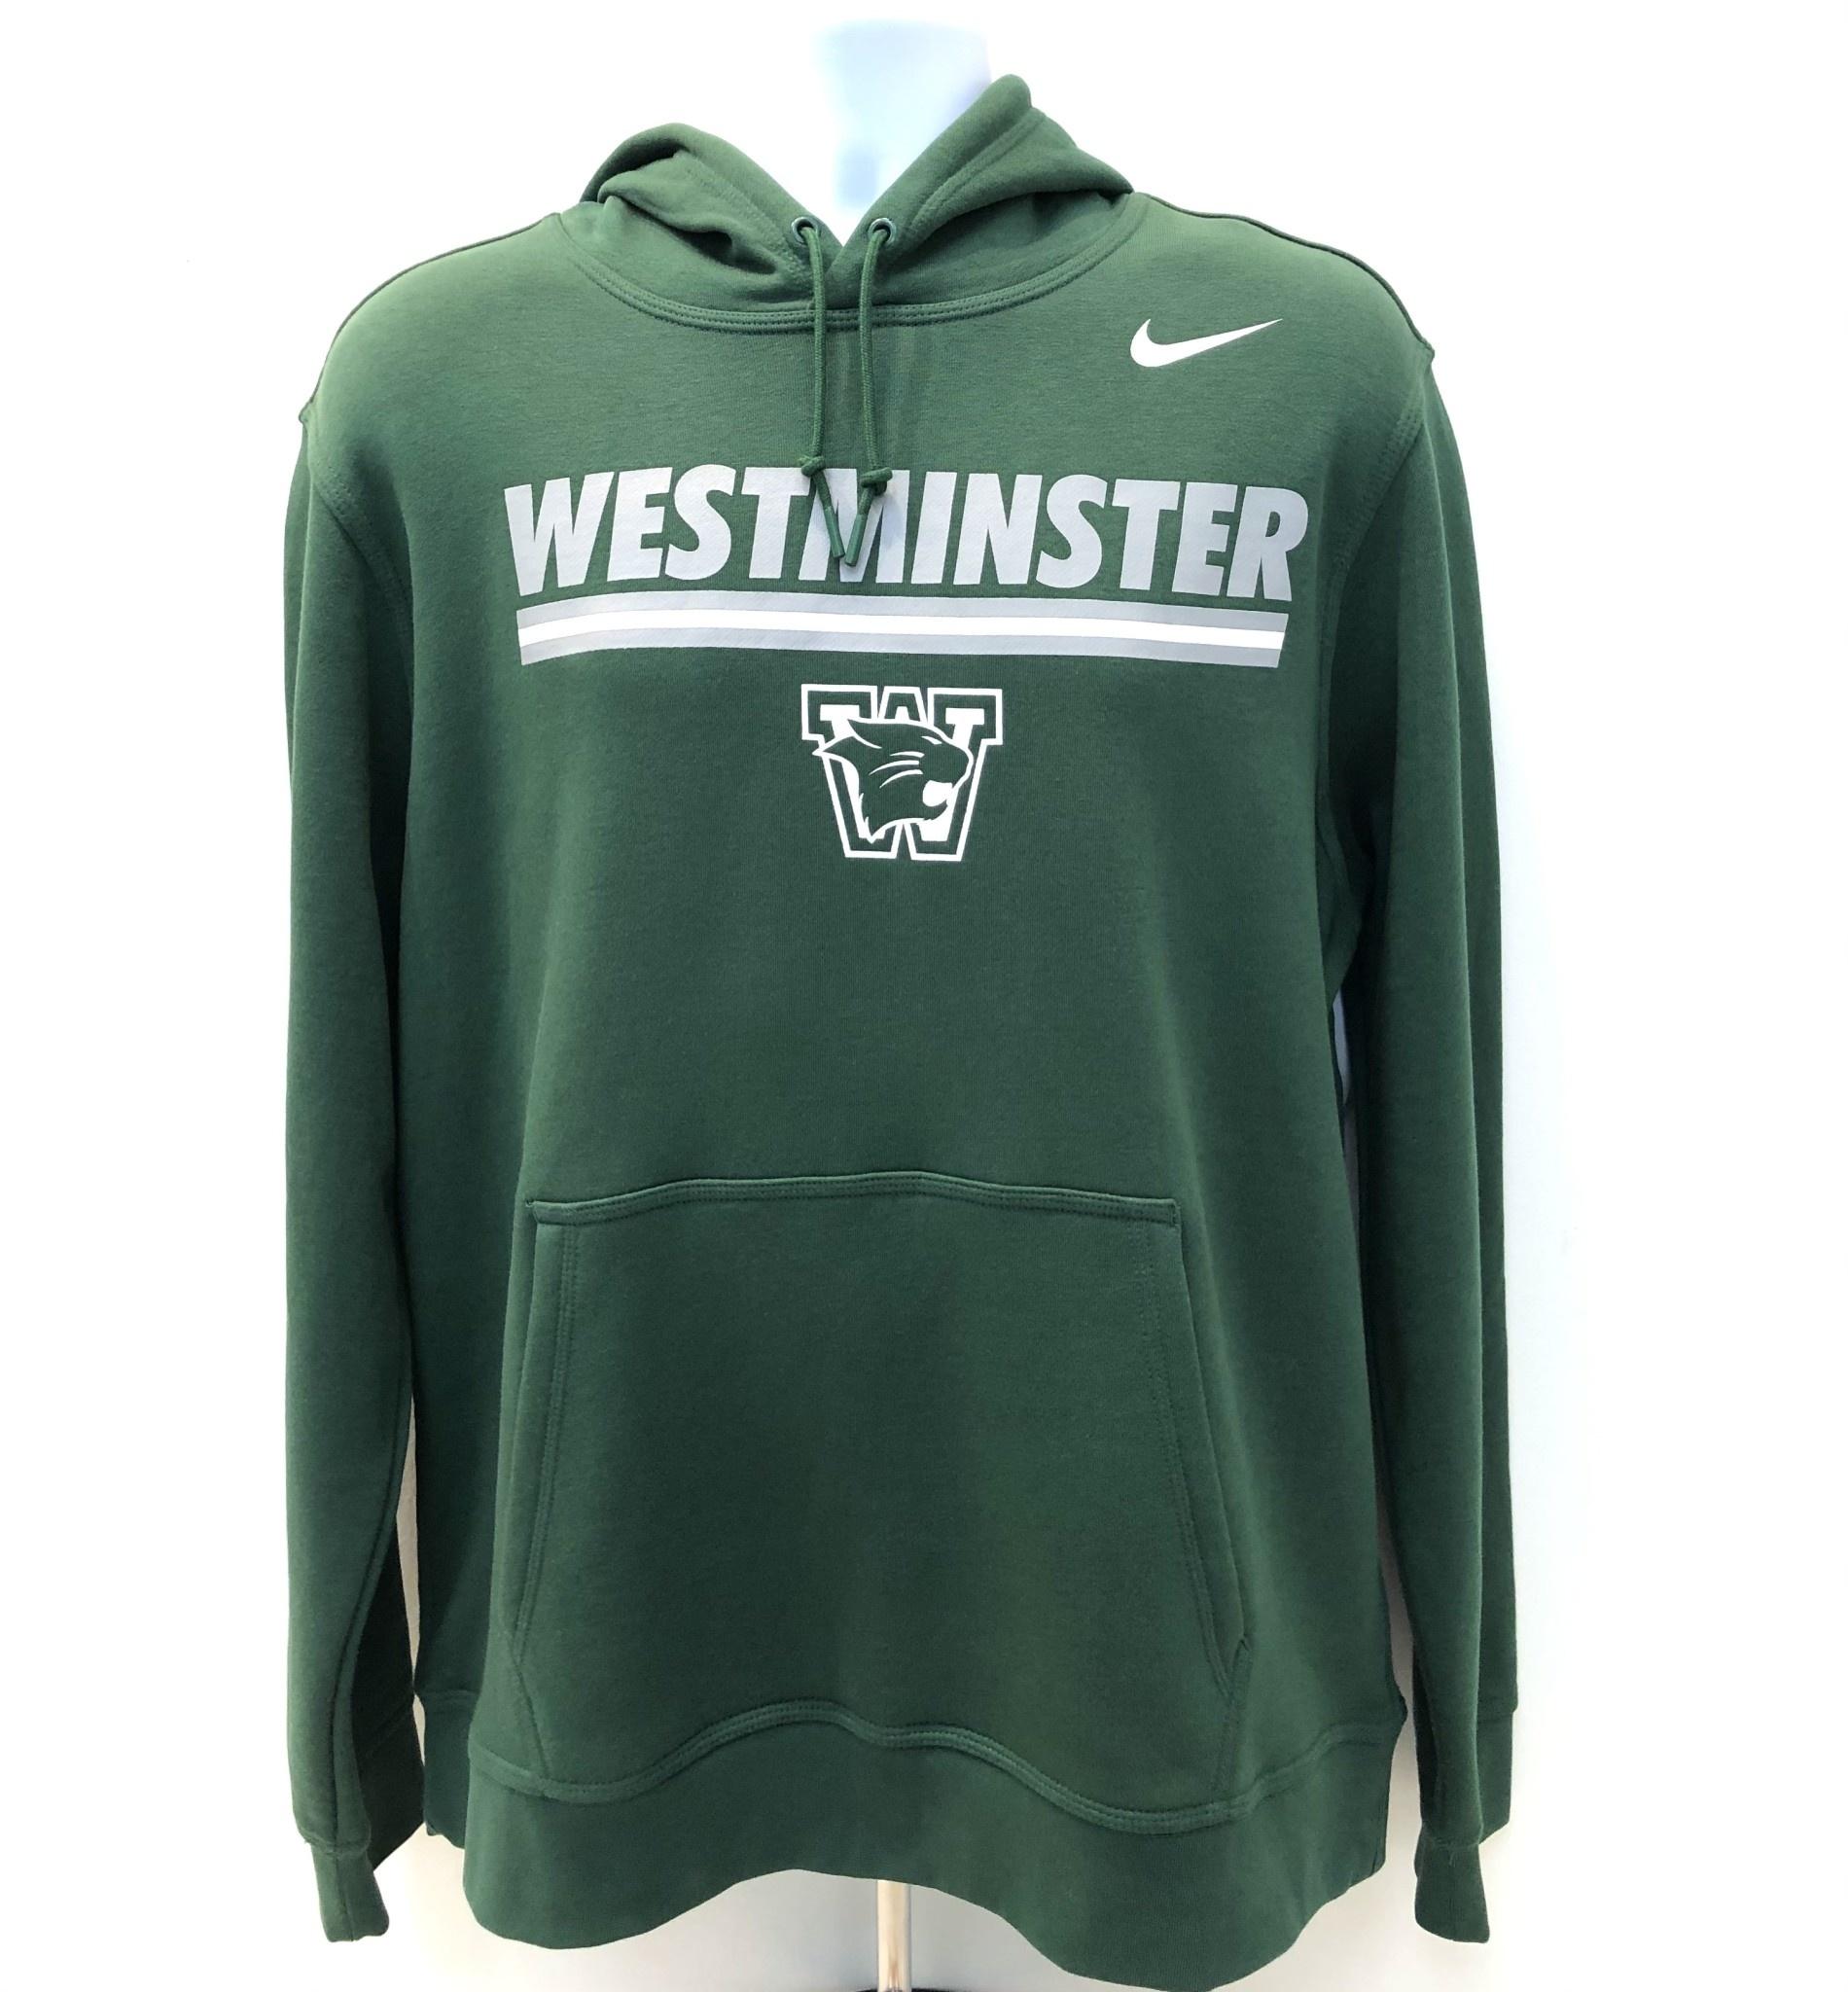 Nike Sweatshirt: Nike Stadium Club Fleece Hoody Westminster with lines -- Green